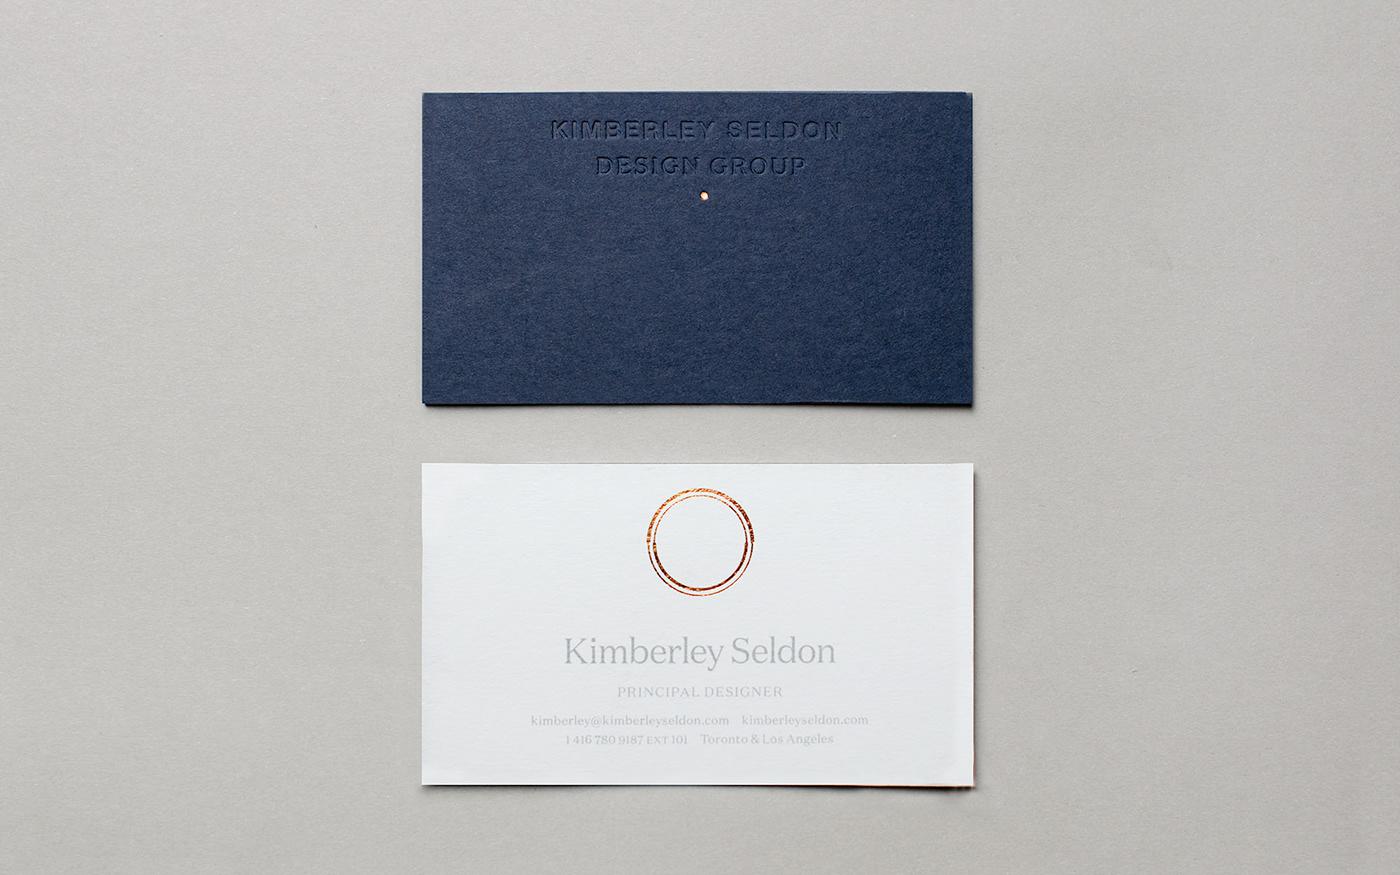 interior design ,branding ,print,logo,lifestyle,luxury,Canada